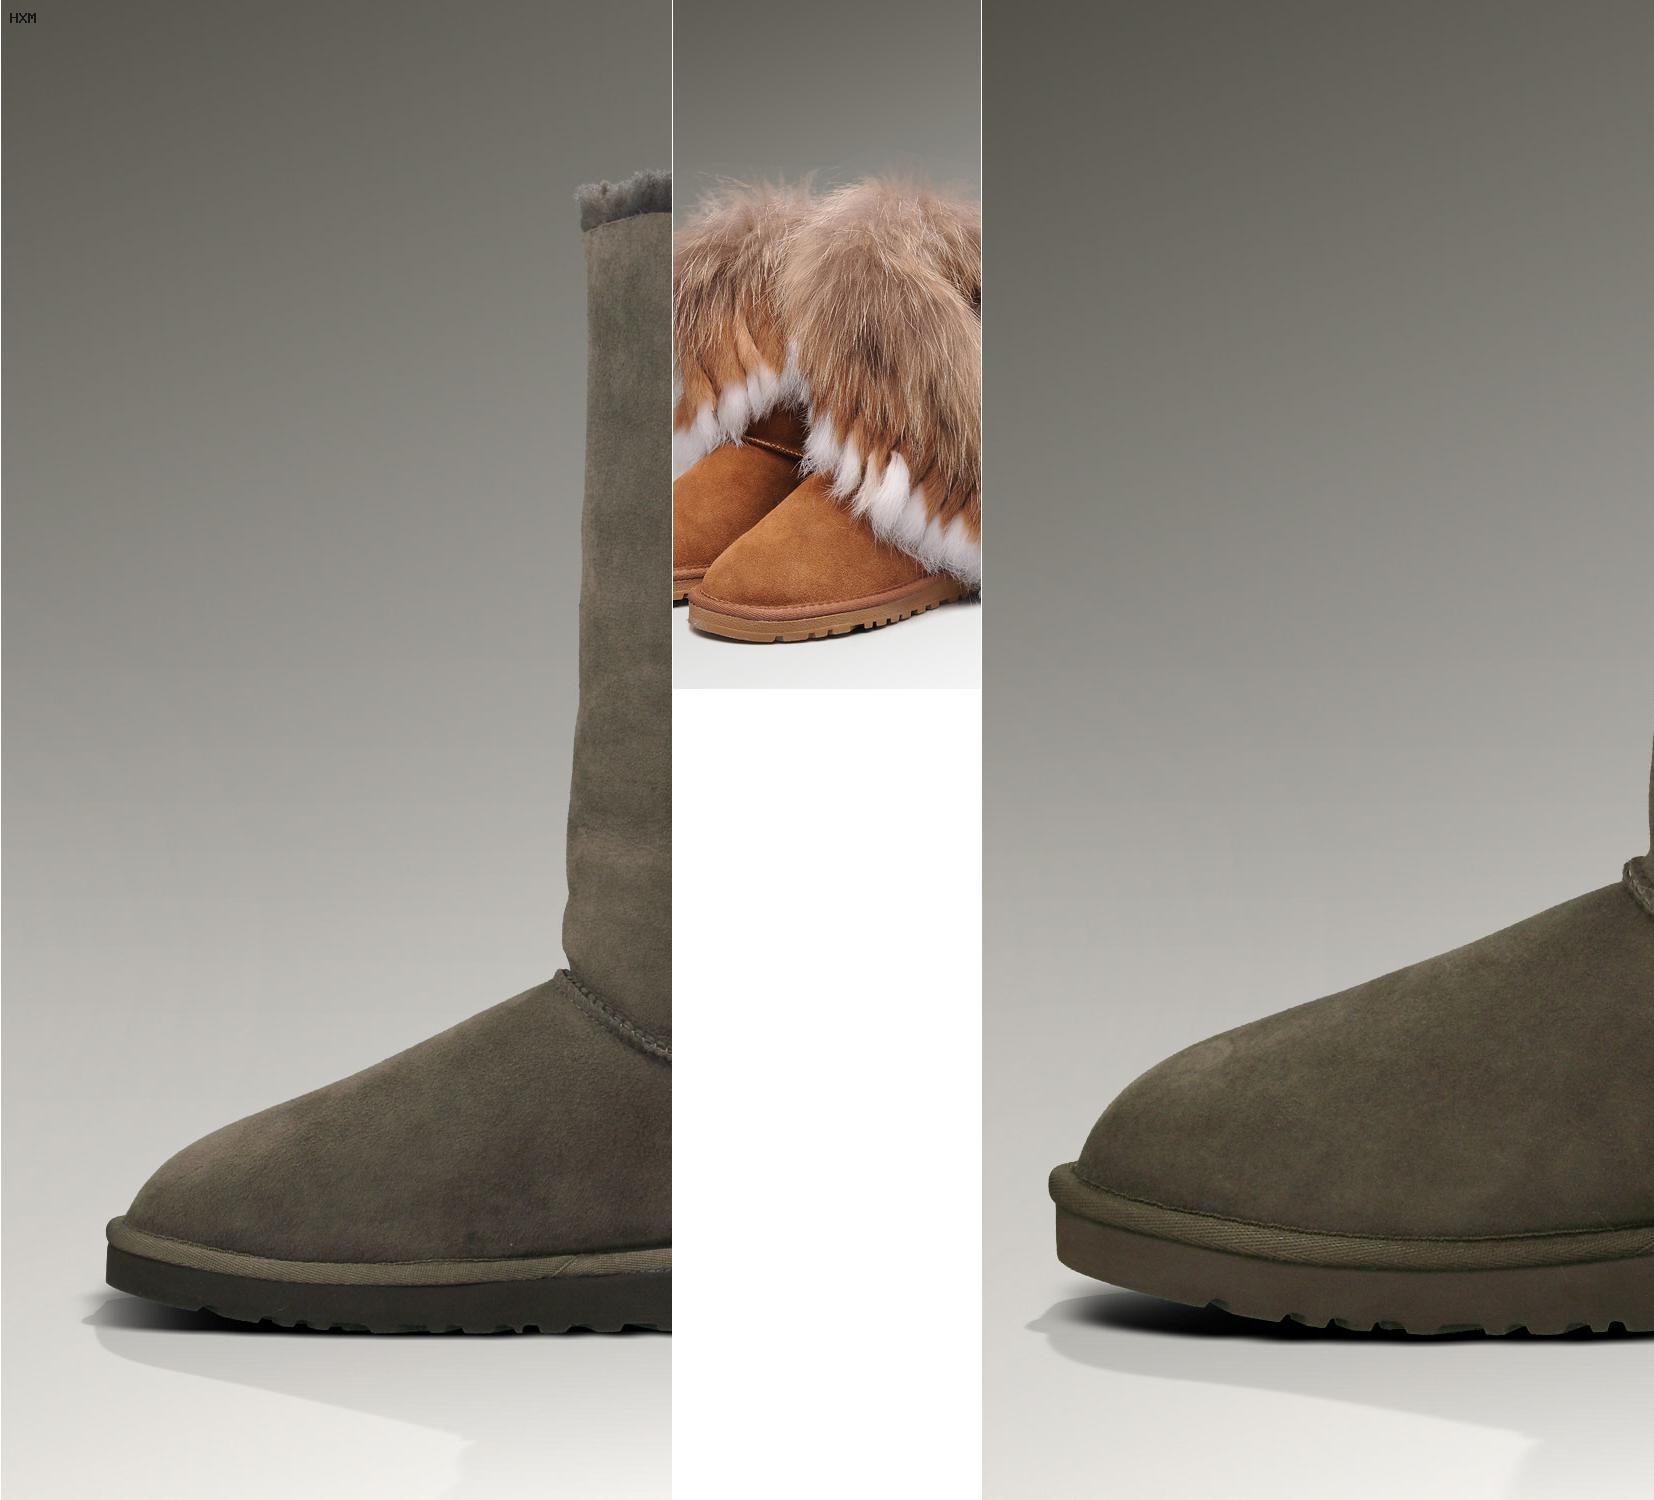 precios de botas marca ugg australia